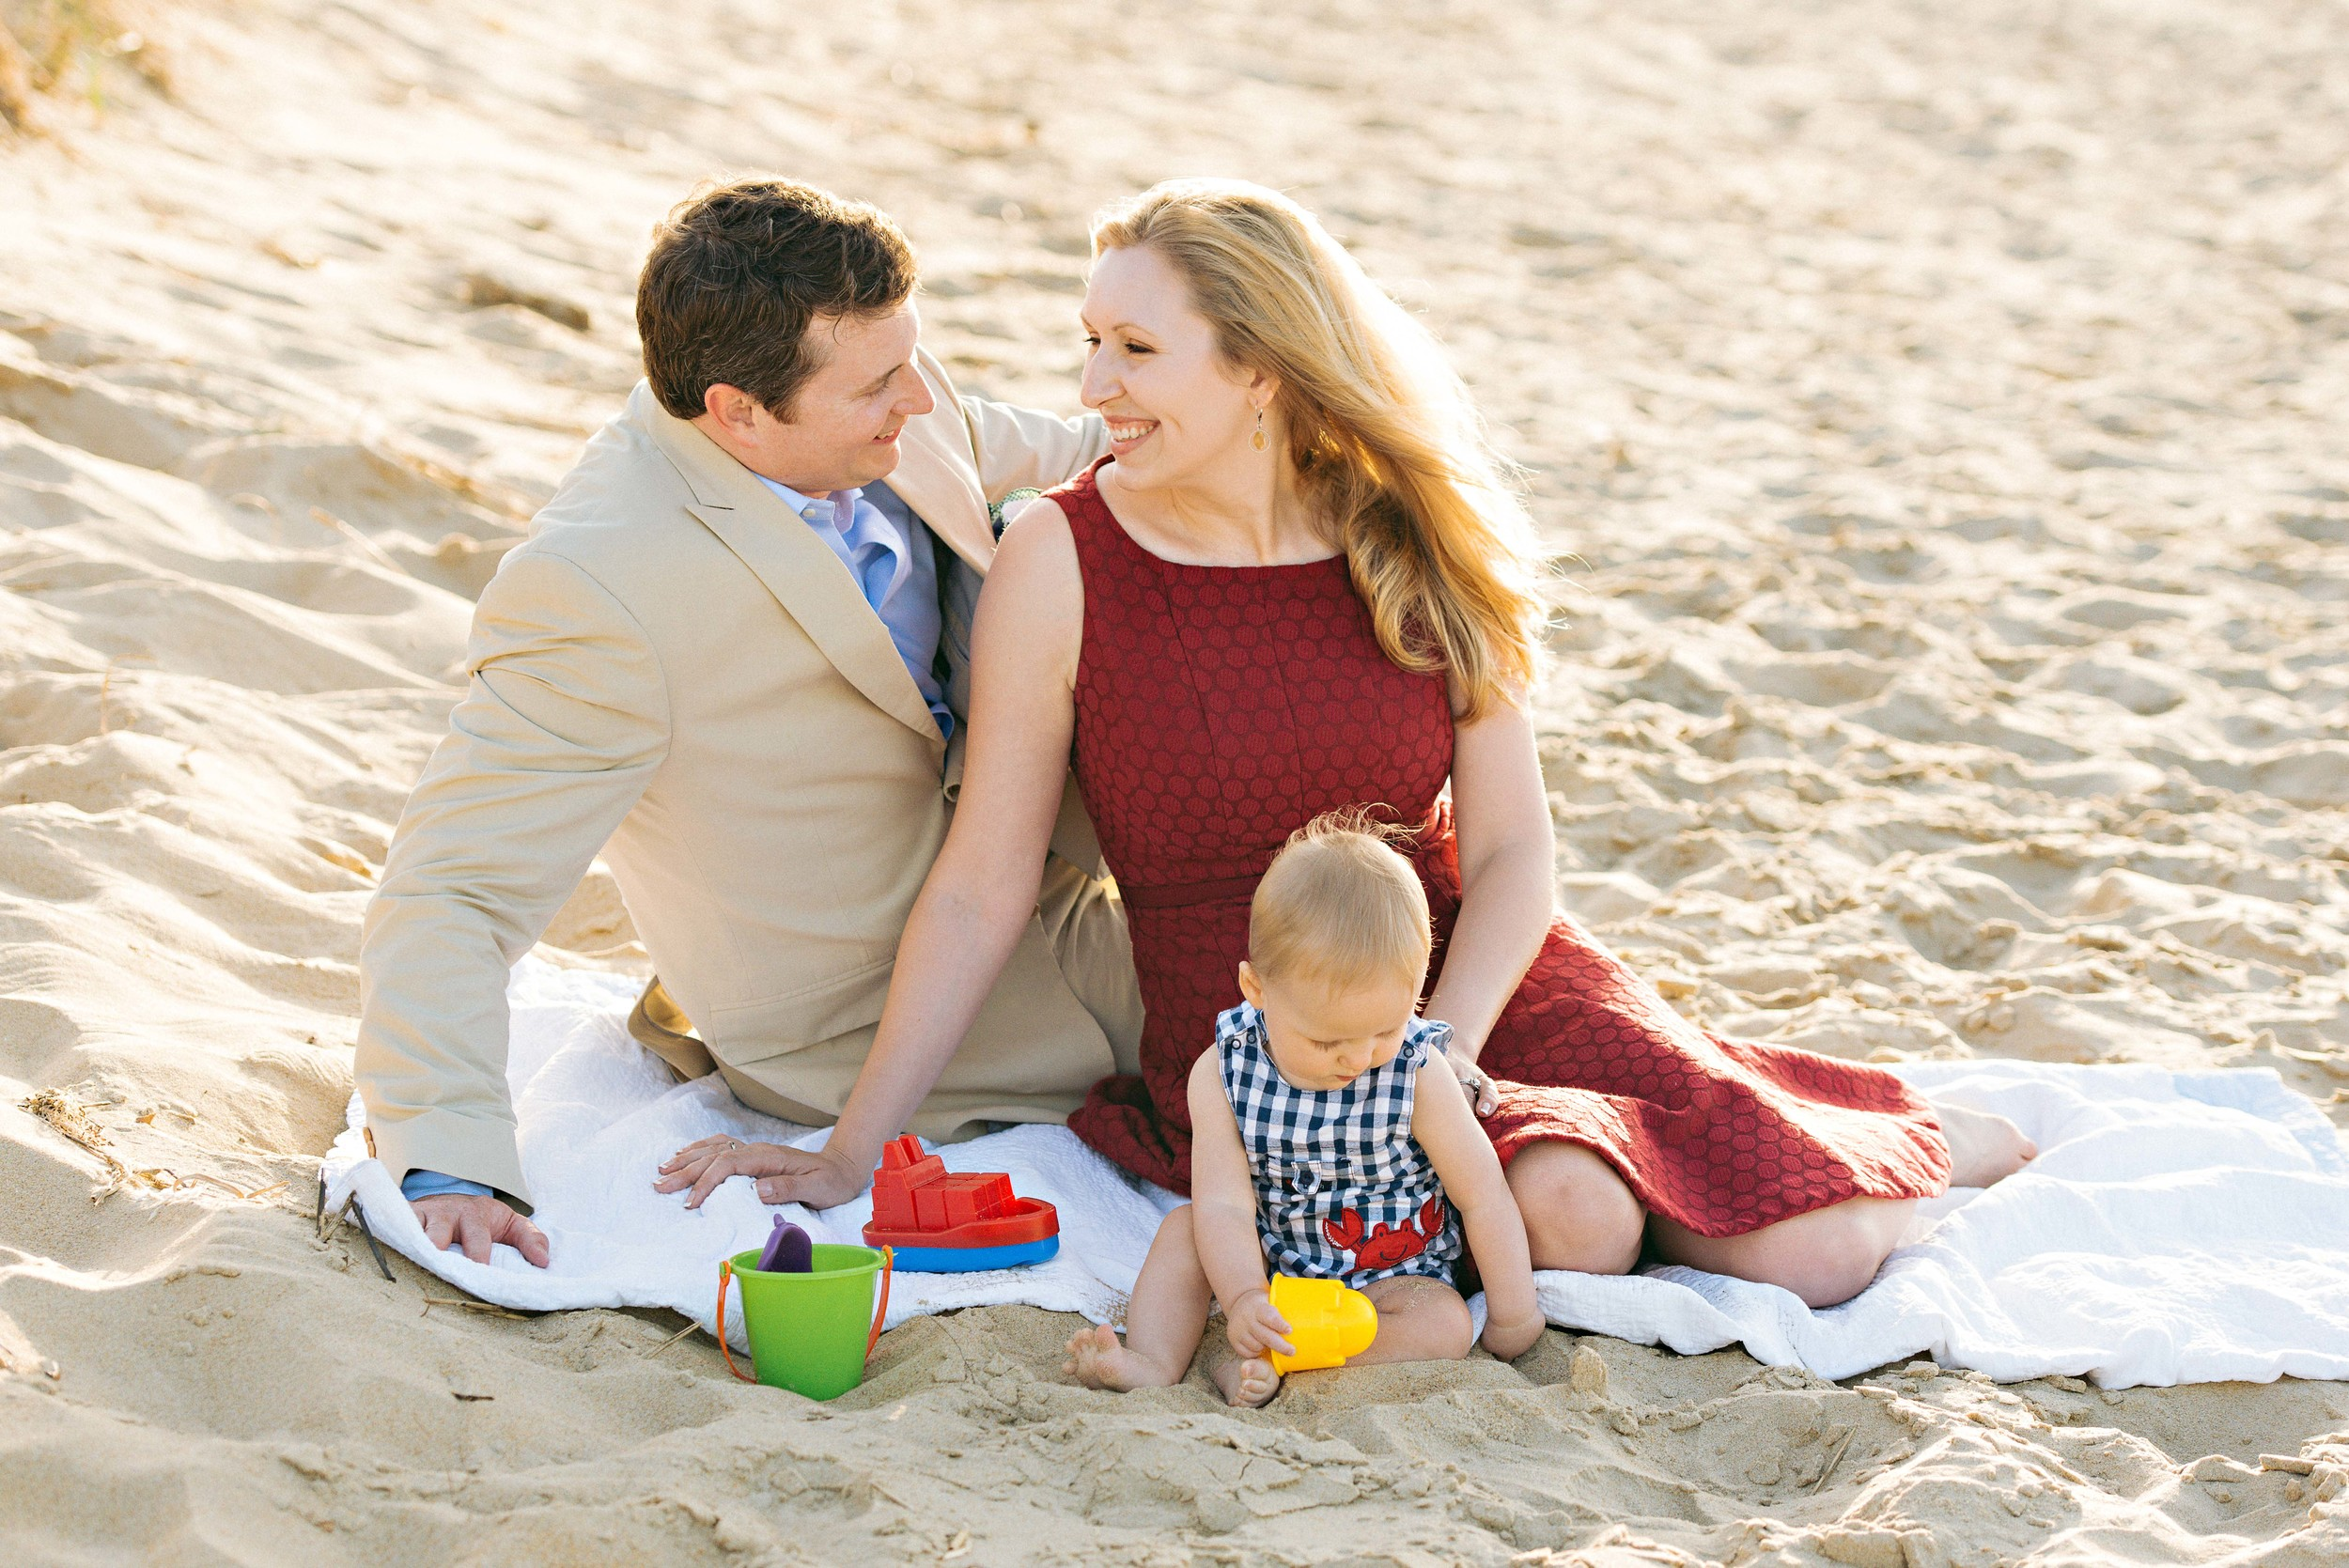 norfolk-virginia-beach-chesapeake-sandbridge-portsmouth-family-photographers-melissa-bliss-photography